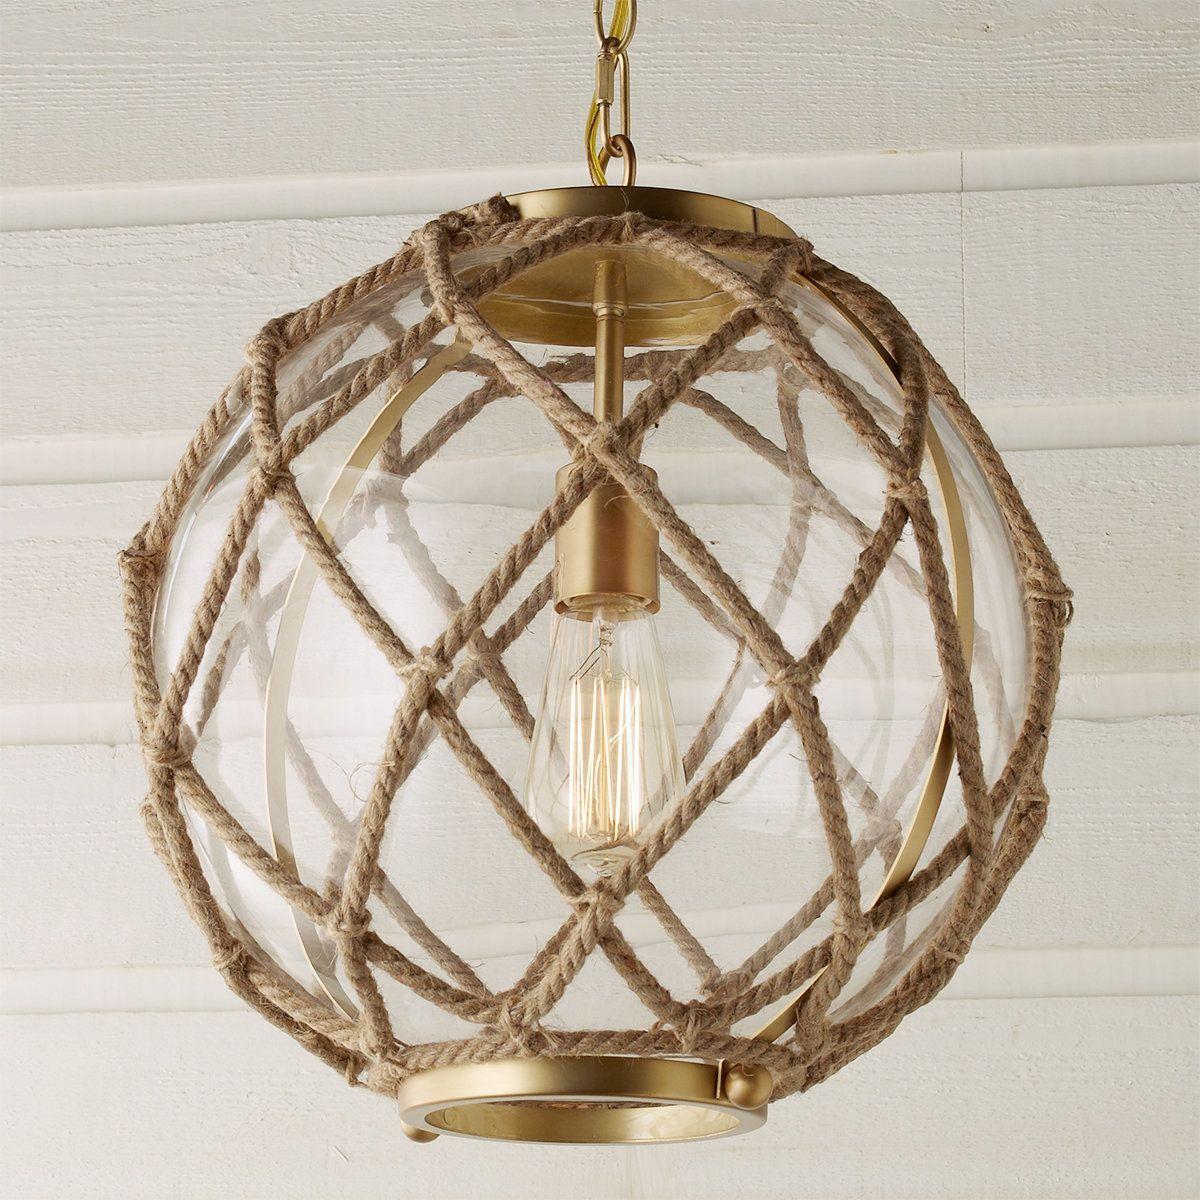 Jute Rope Globe Pendant Rope Pendant Light Ball Pendant Lighting Coastal Pendant Lighting